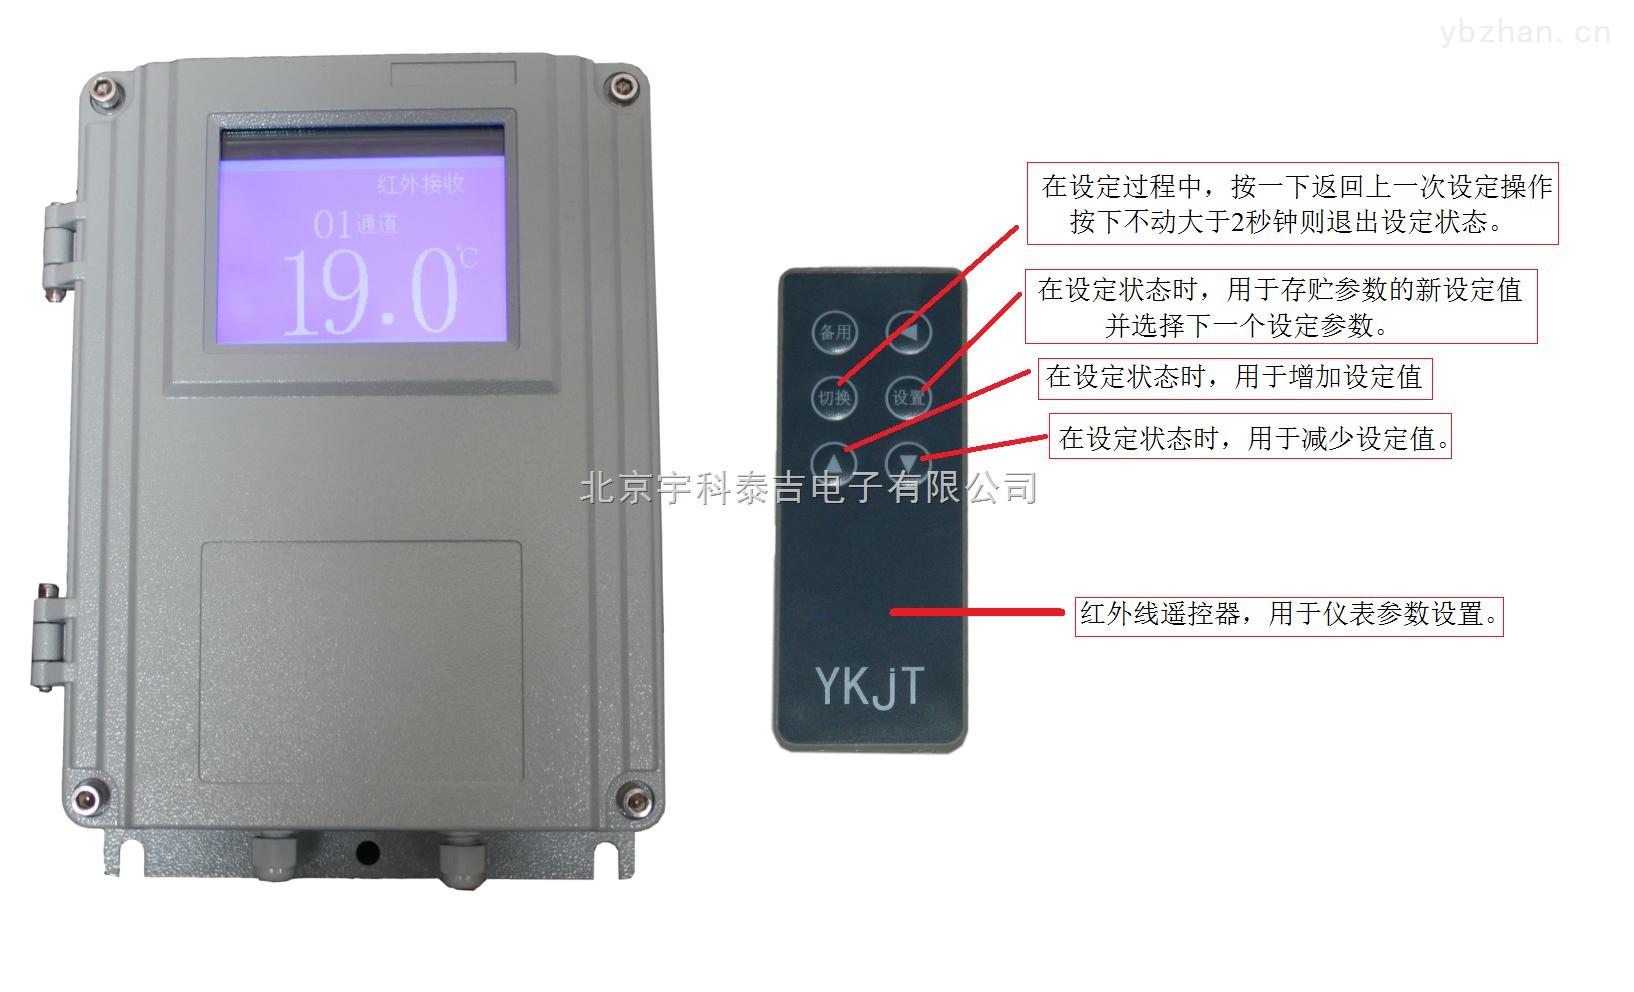 XZ-T20B-专业生产冷库温度,单总线DS18B20温度巡检仪,壁挂液晶屏幕同时显示